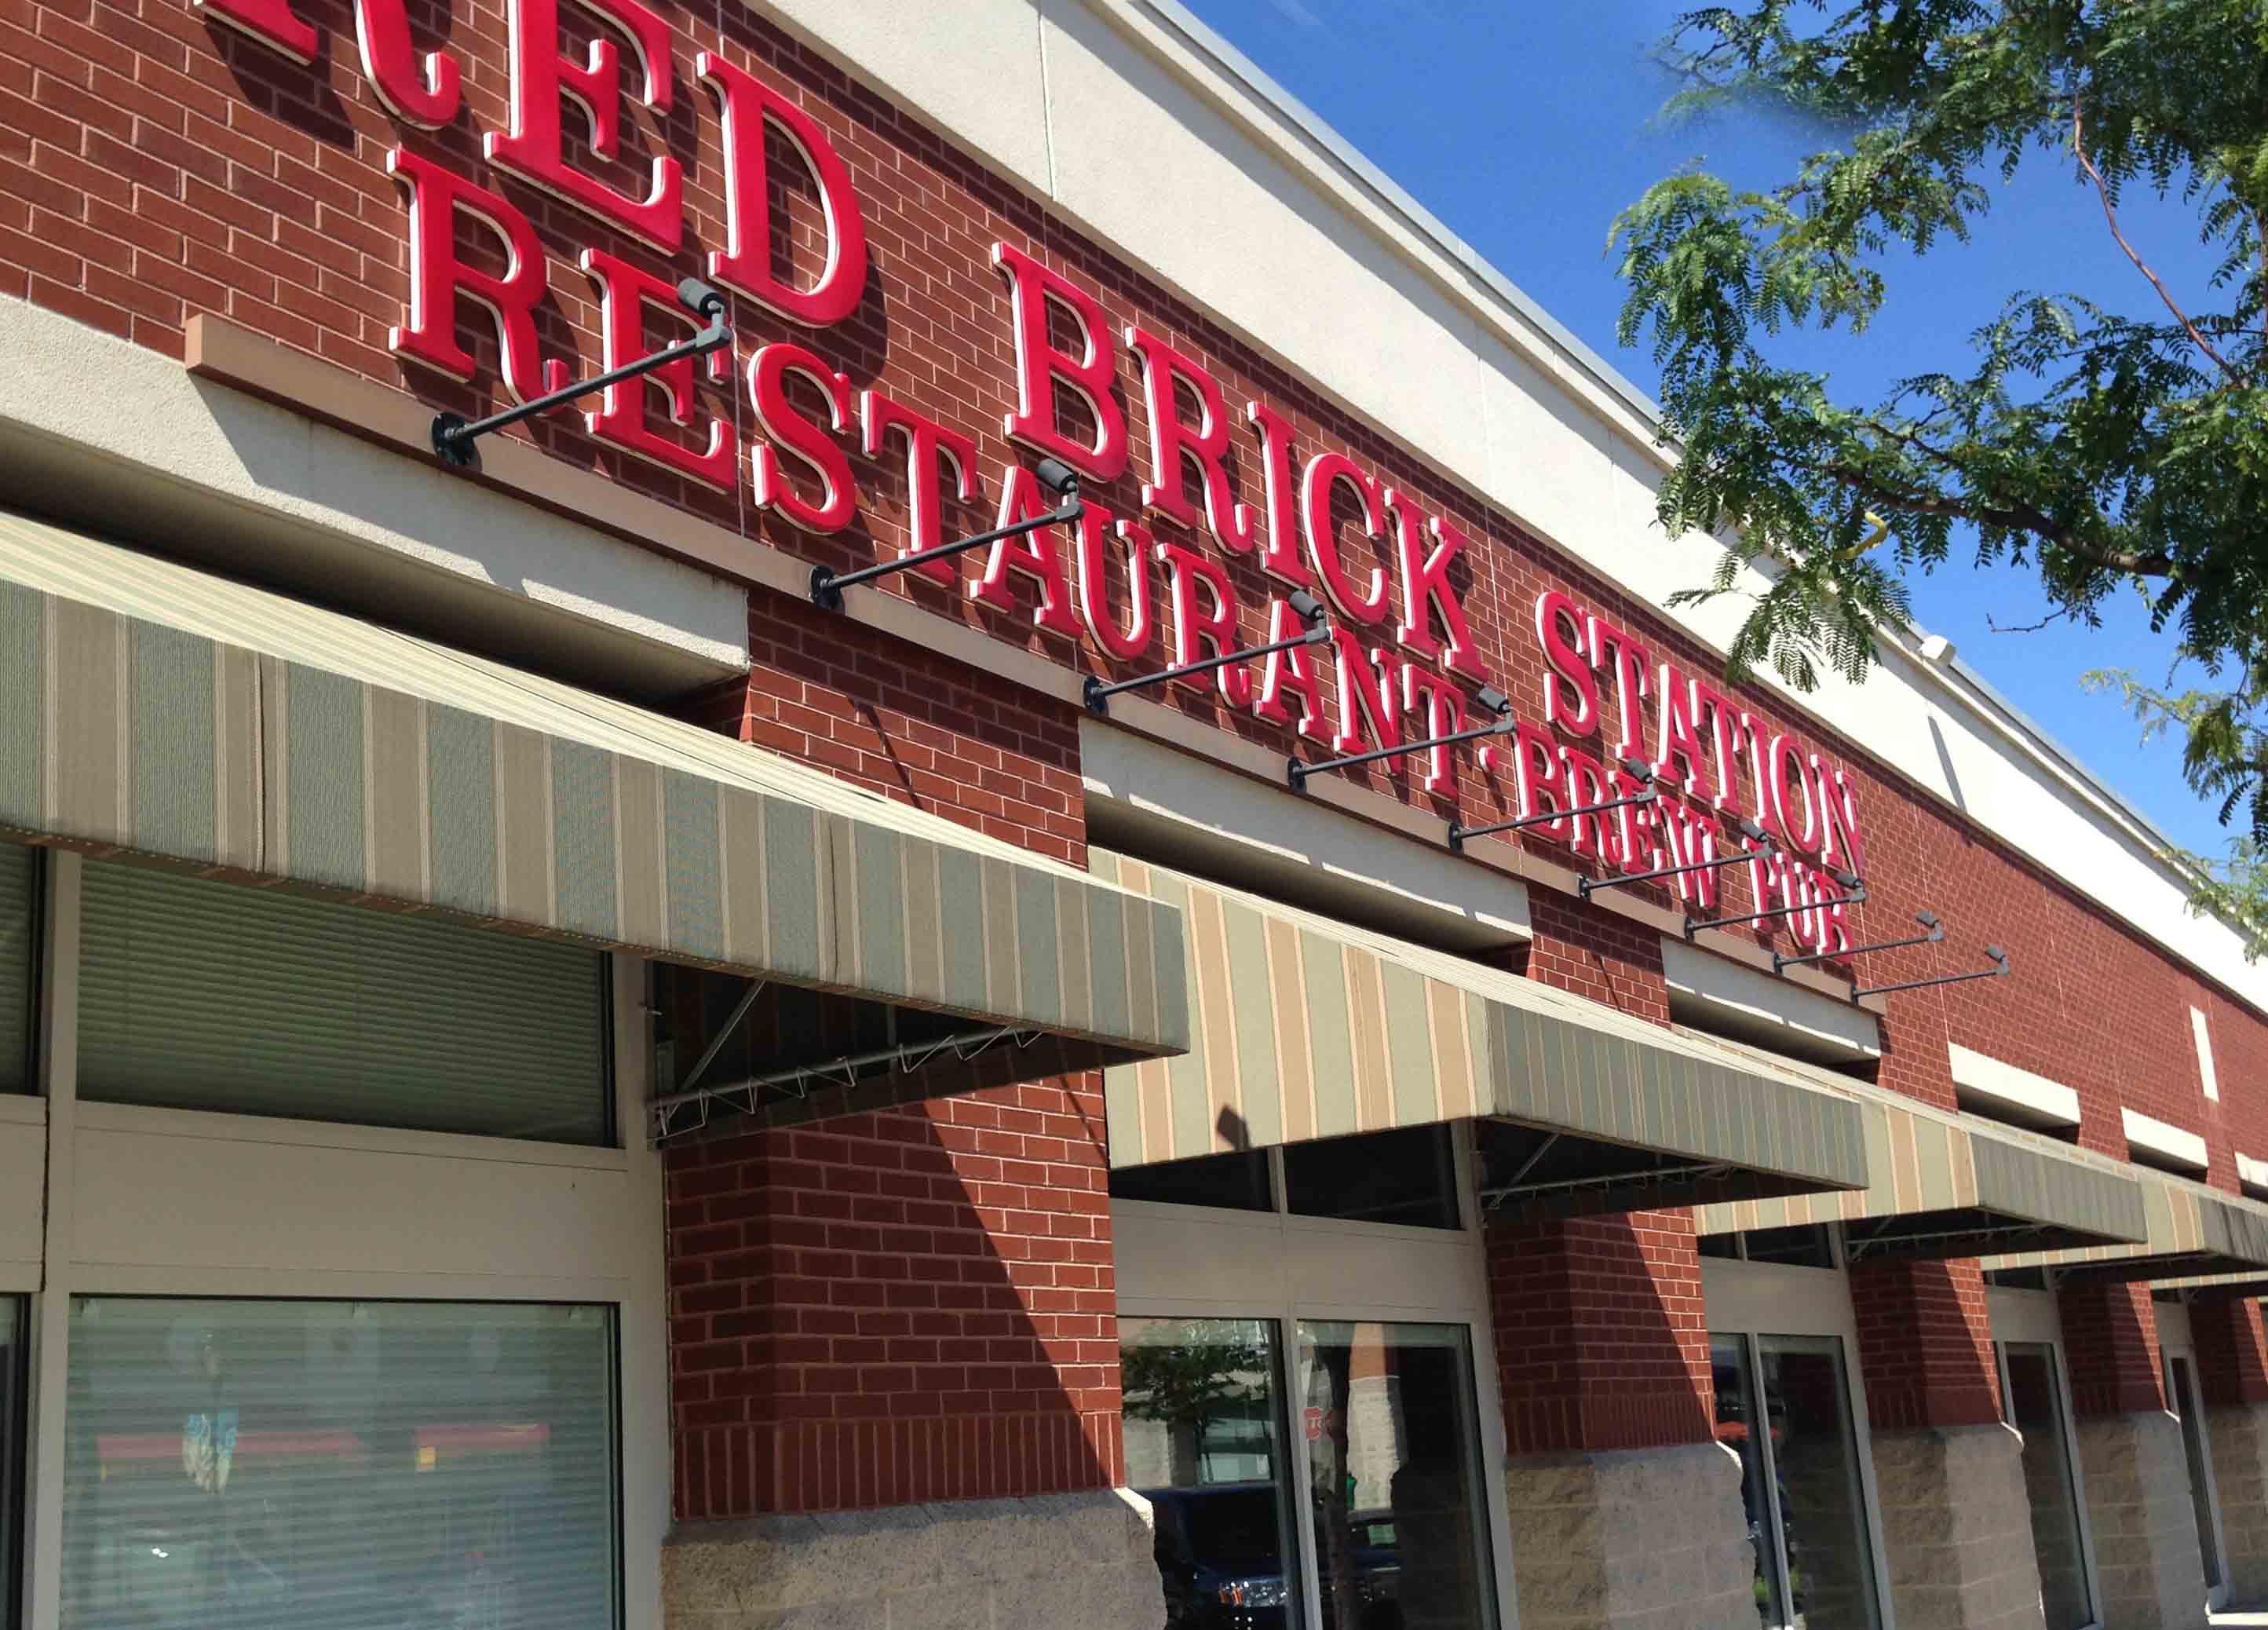 167. Red Brick Station, White Marsh MD 2013